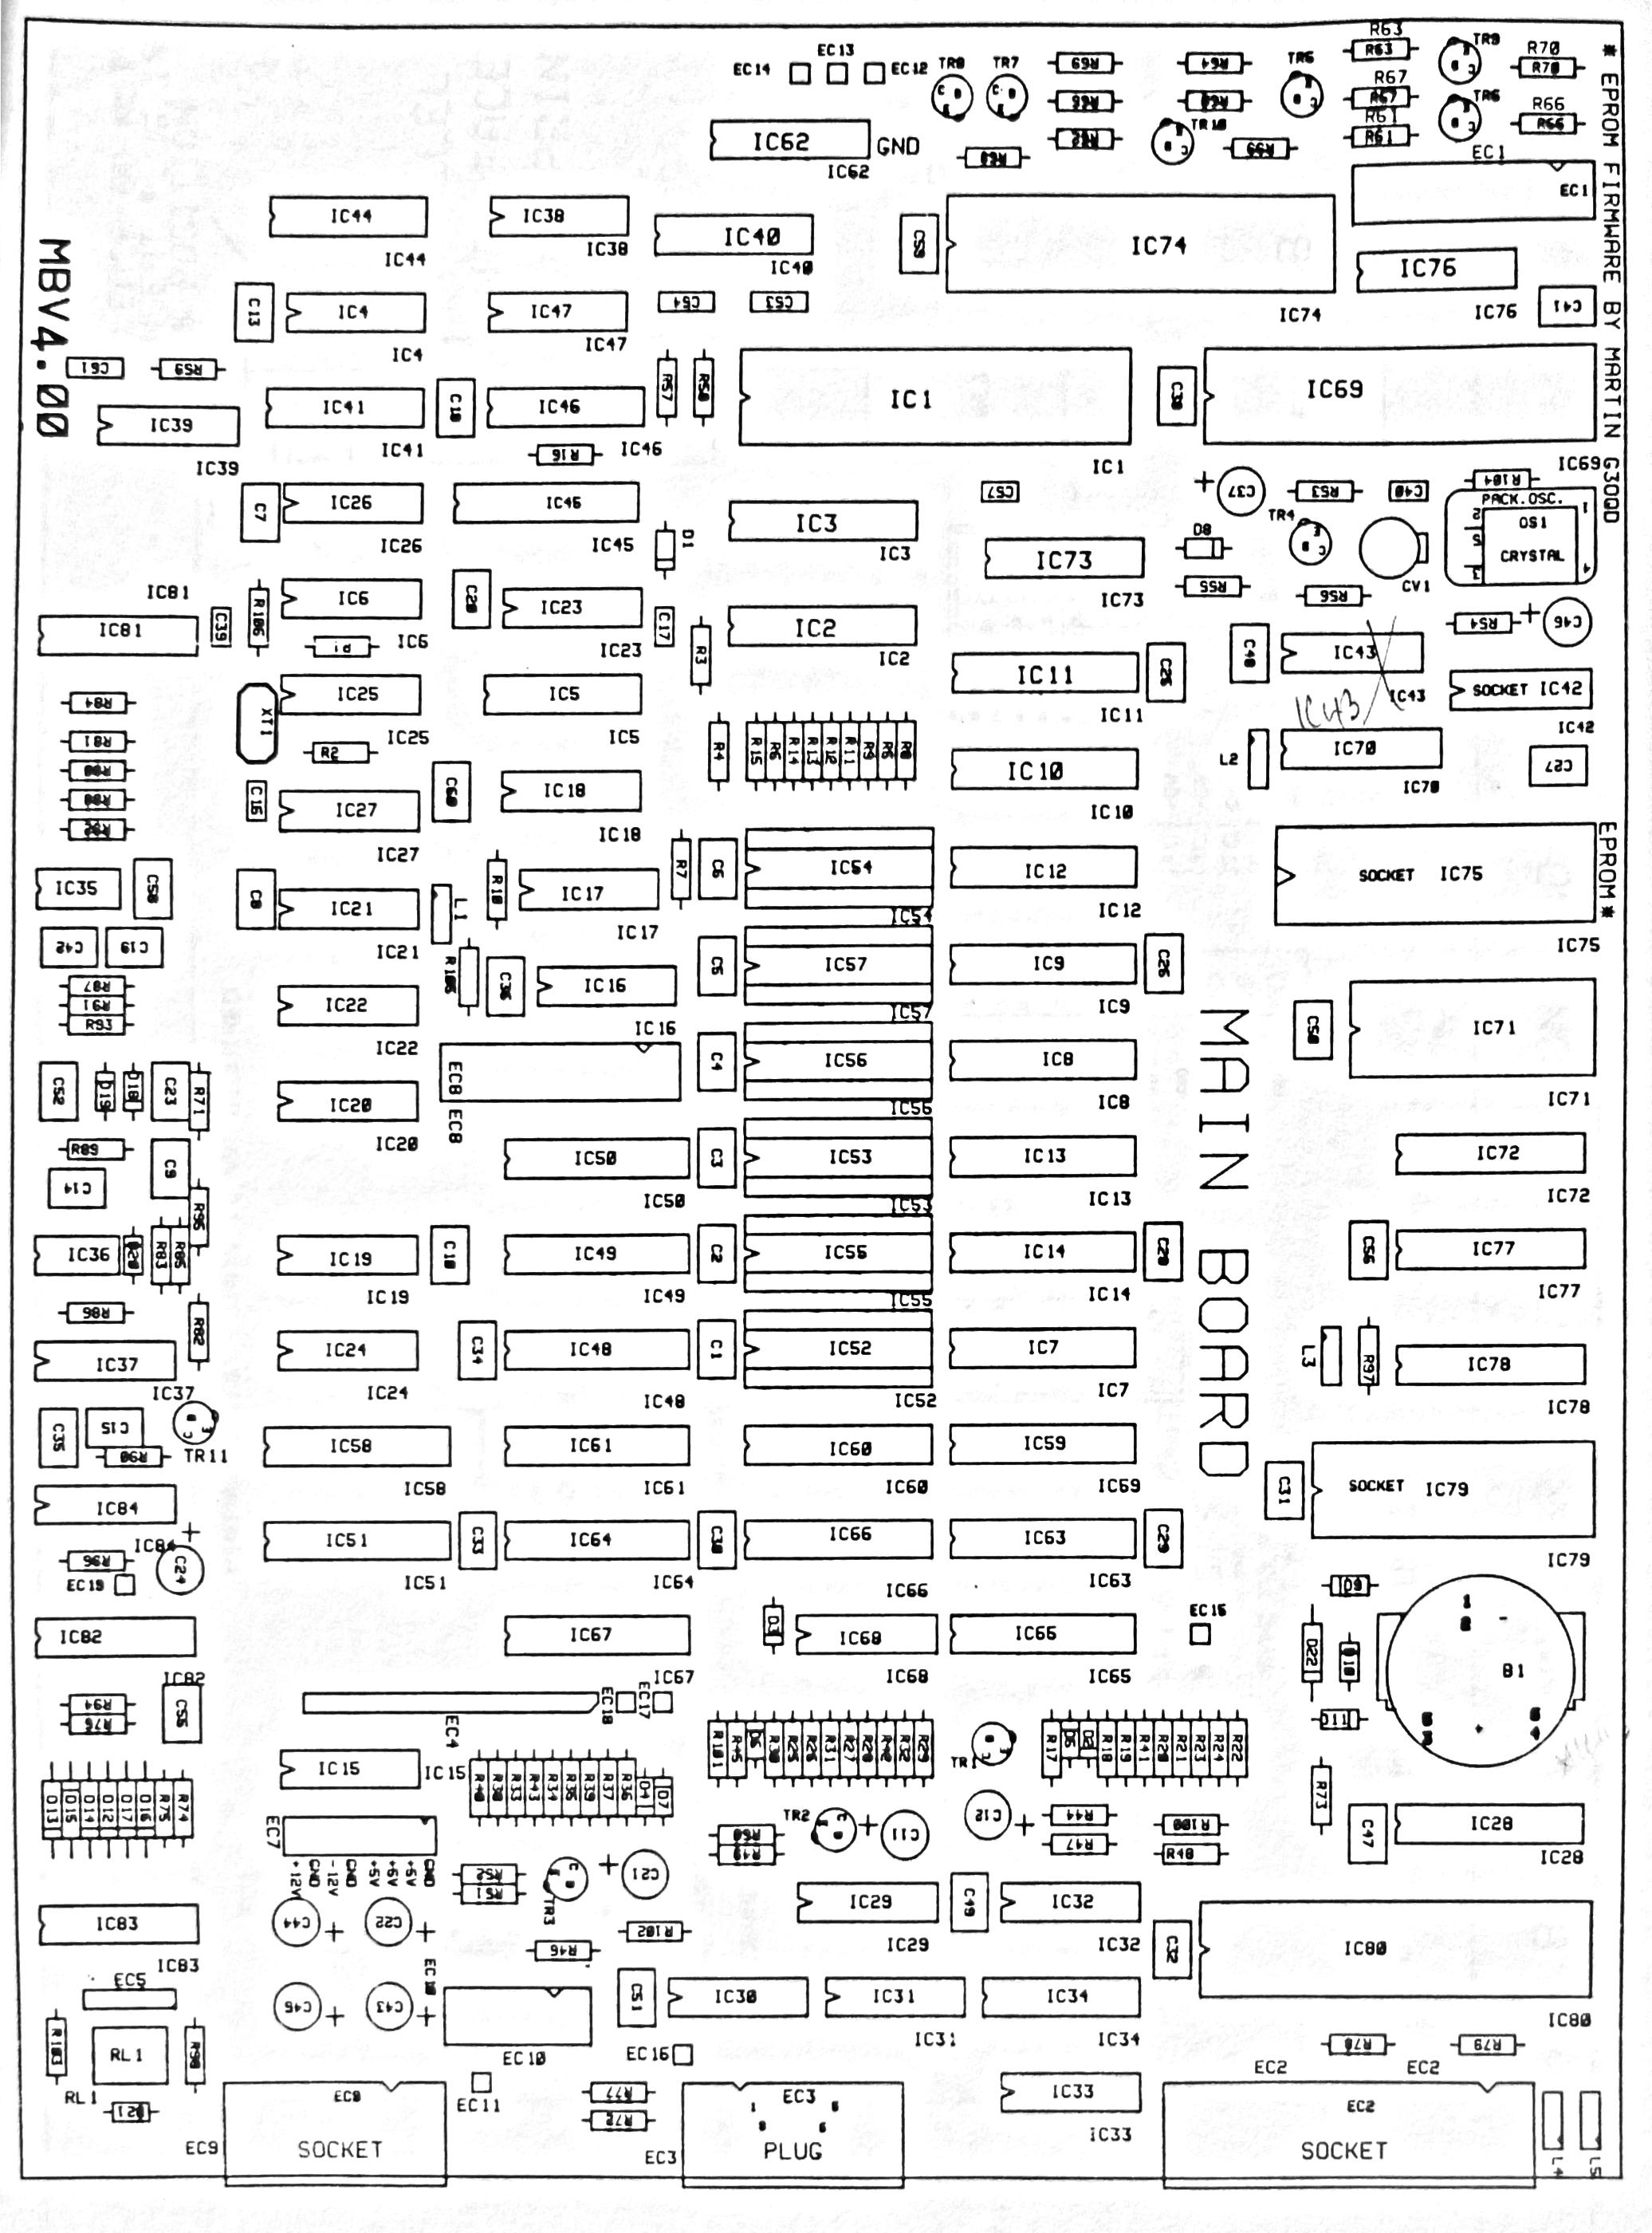 Bruxy Superscan Documentation